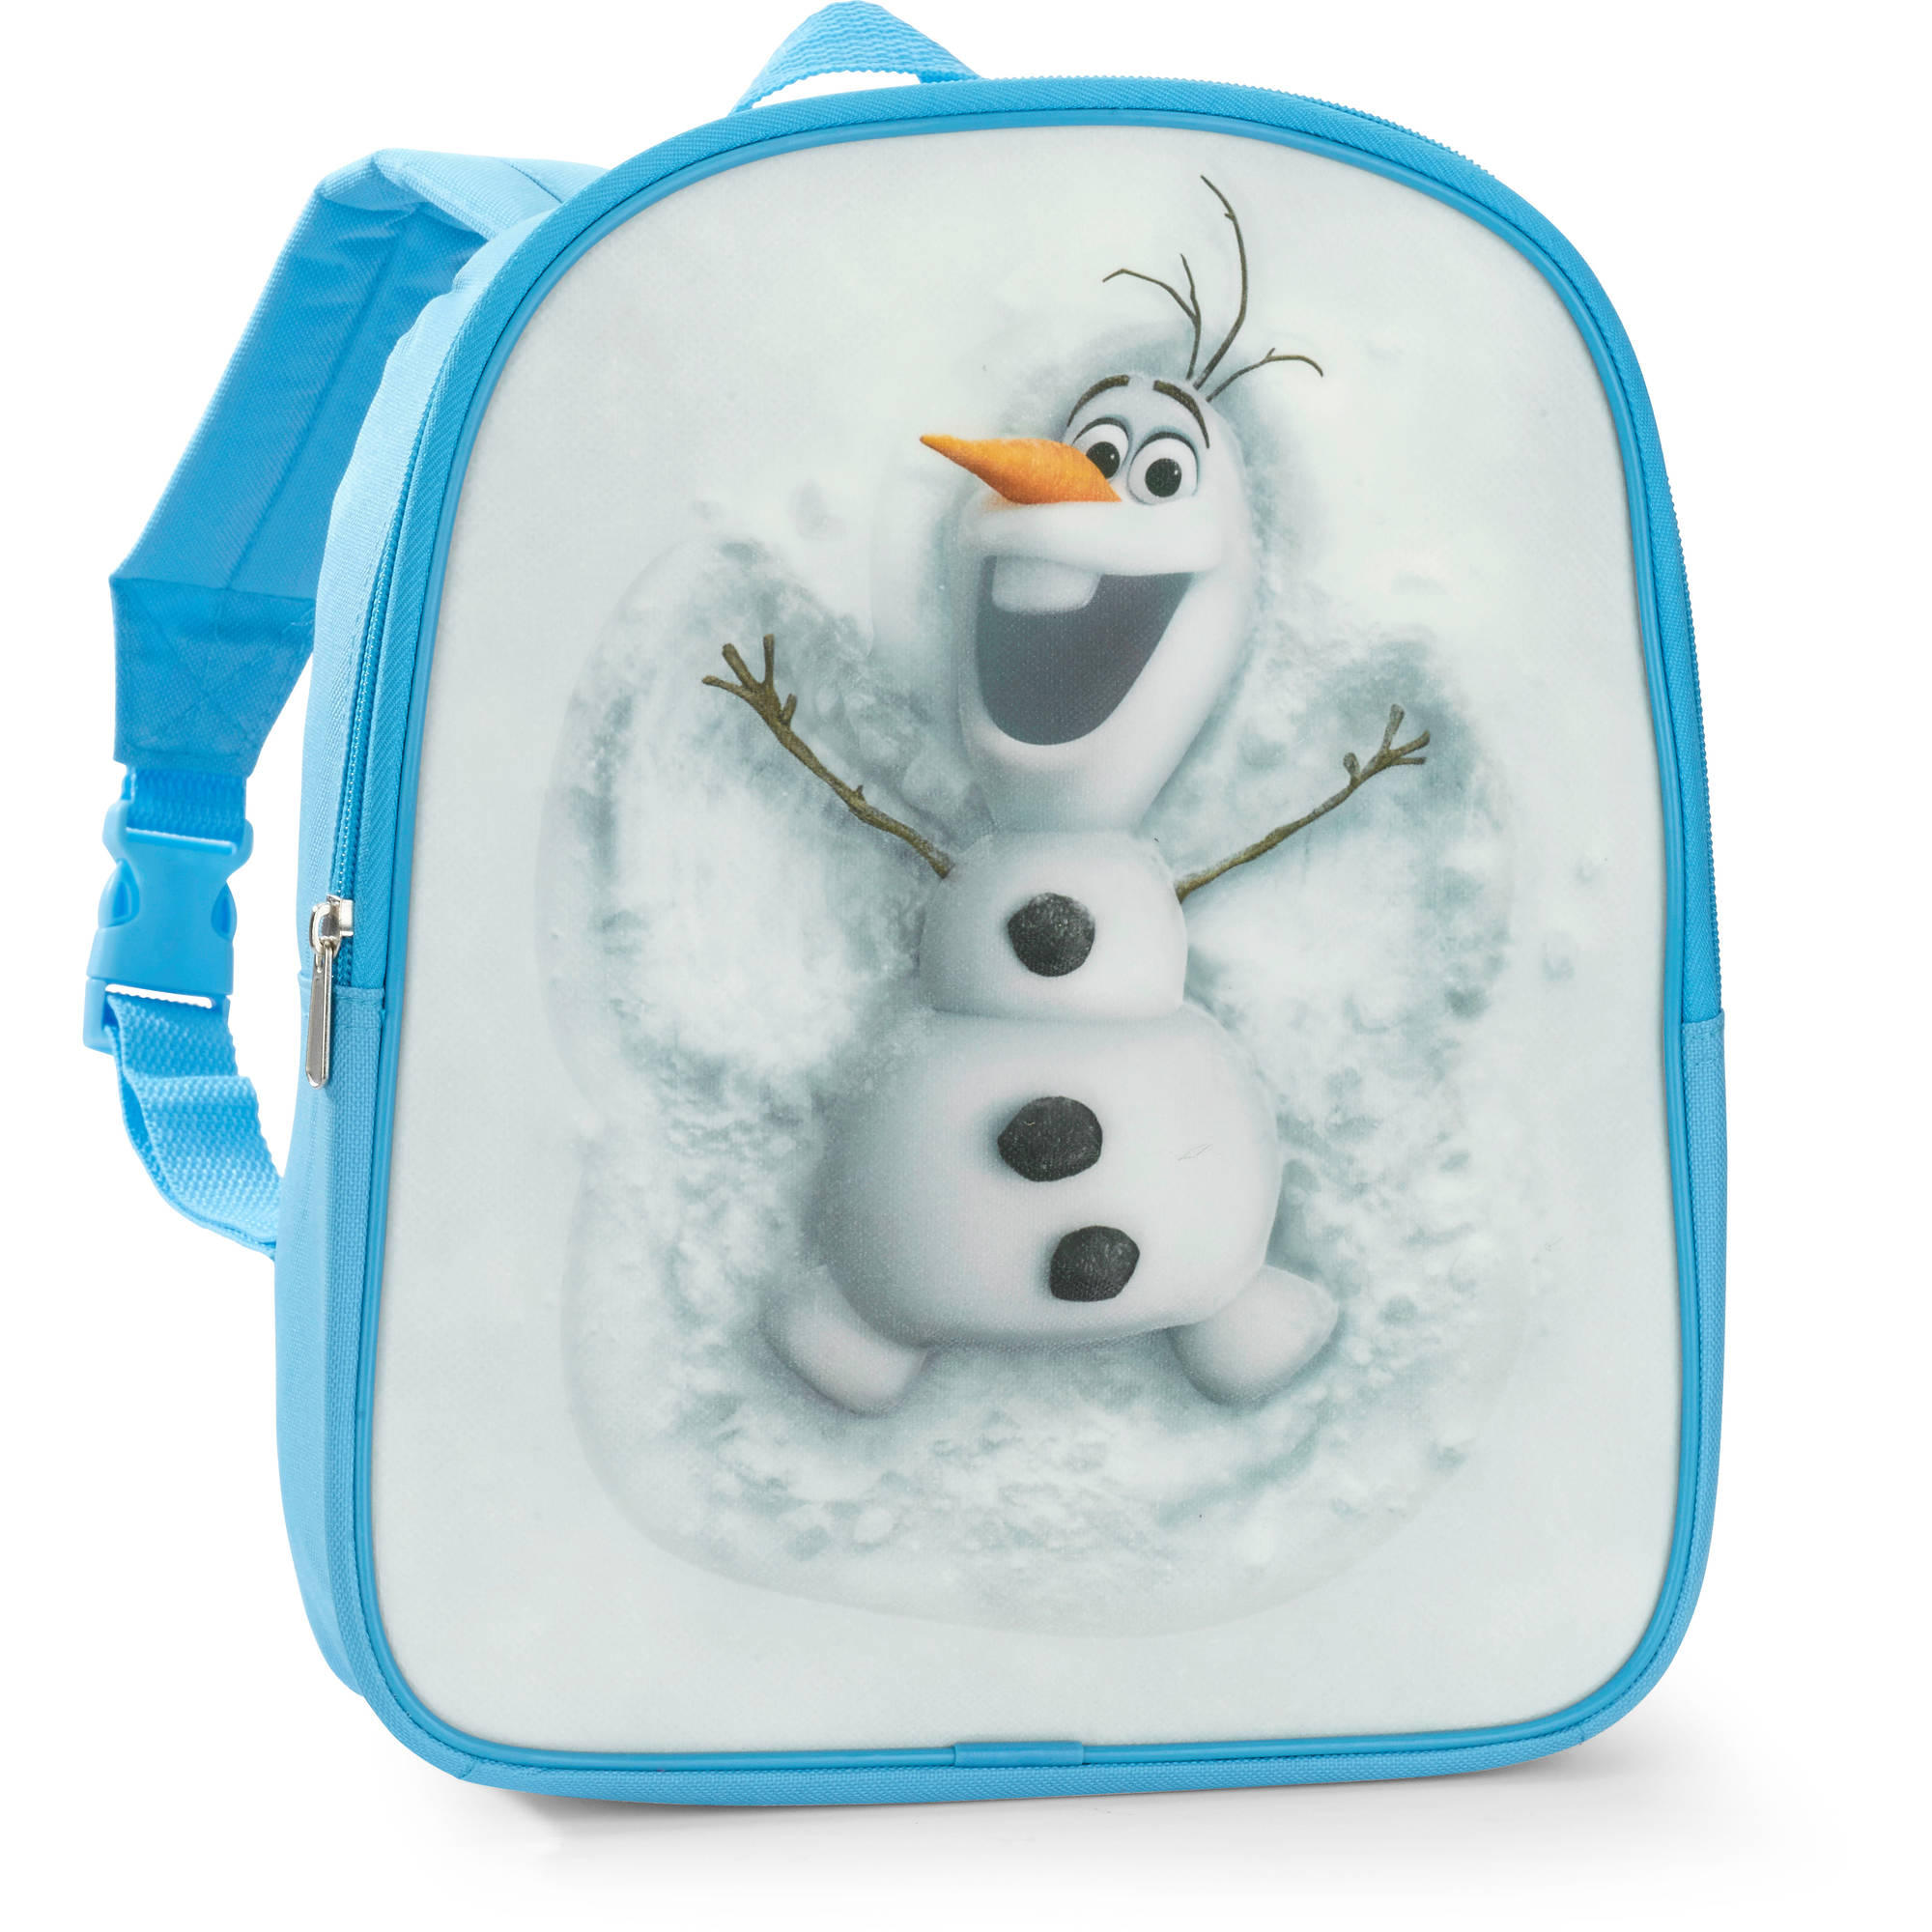 "Disney Frozen Olaf 12"" Backpack"